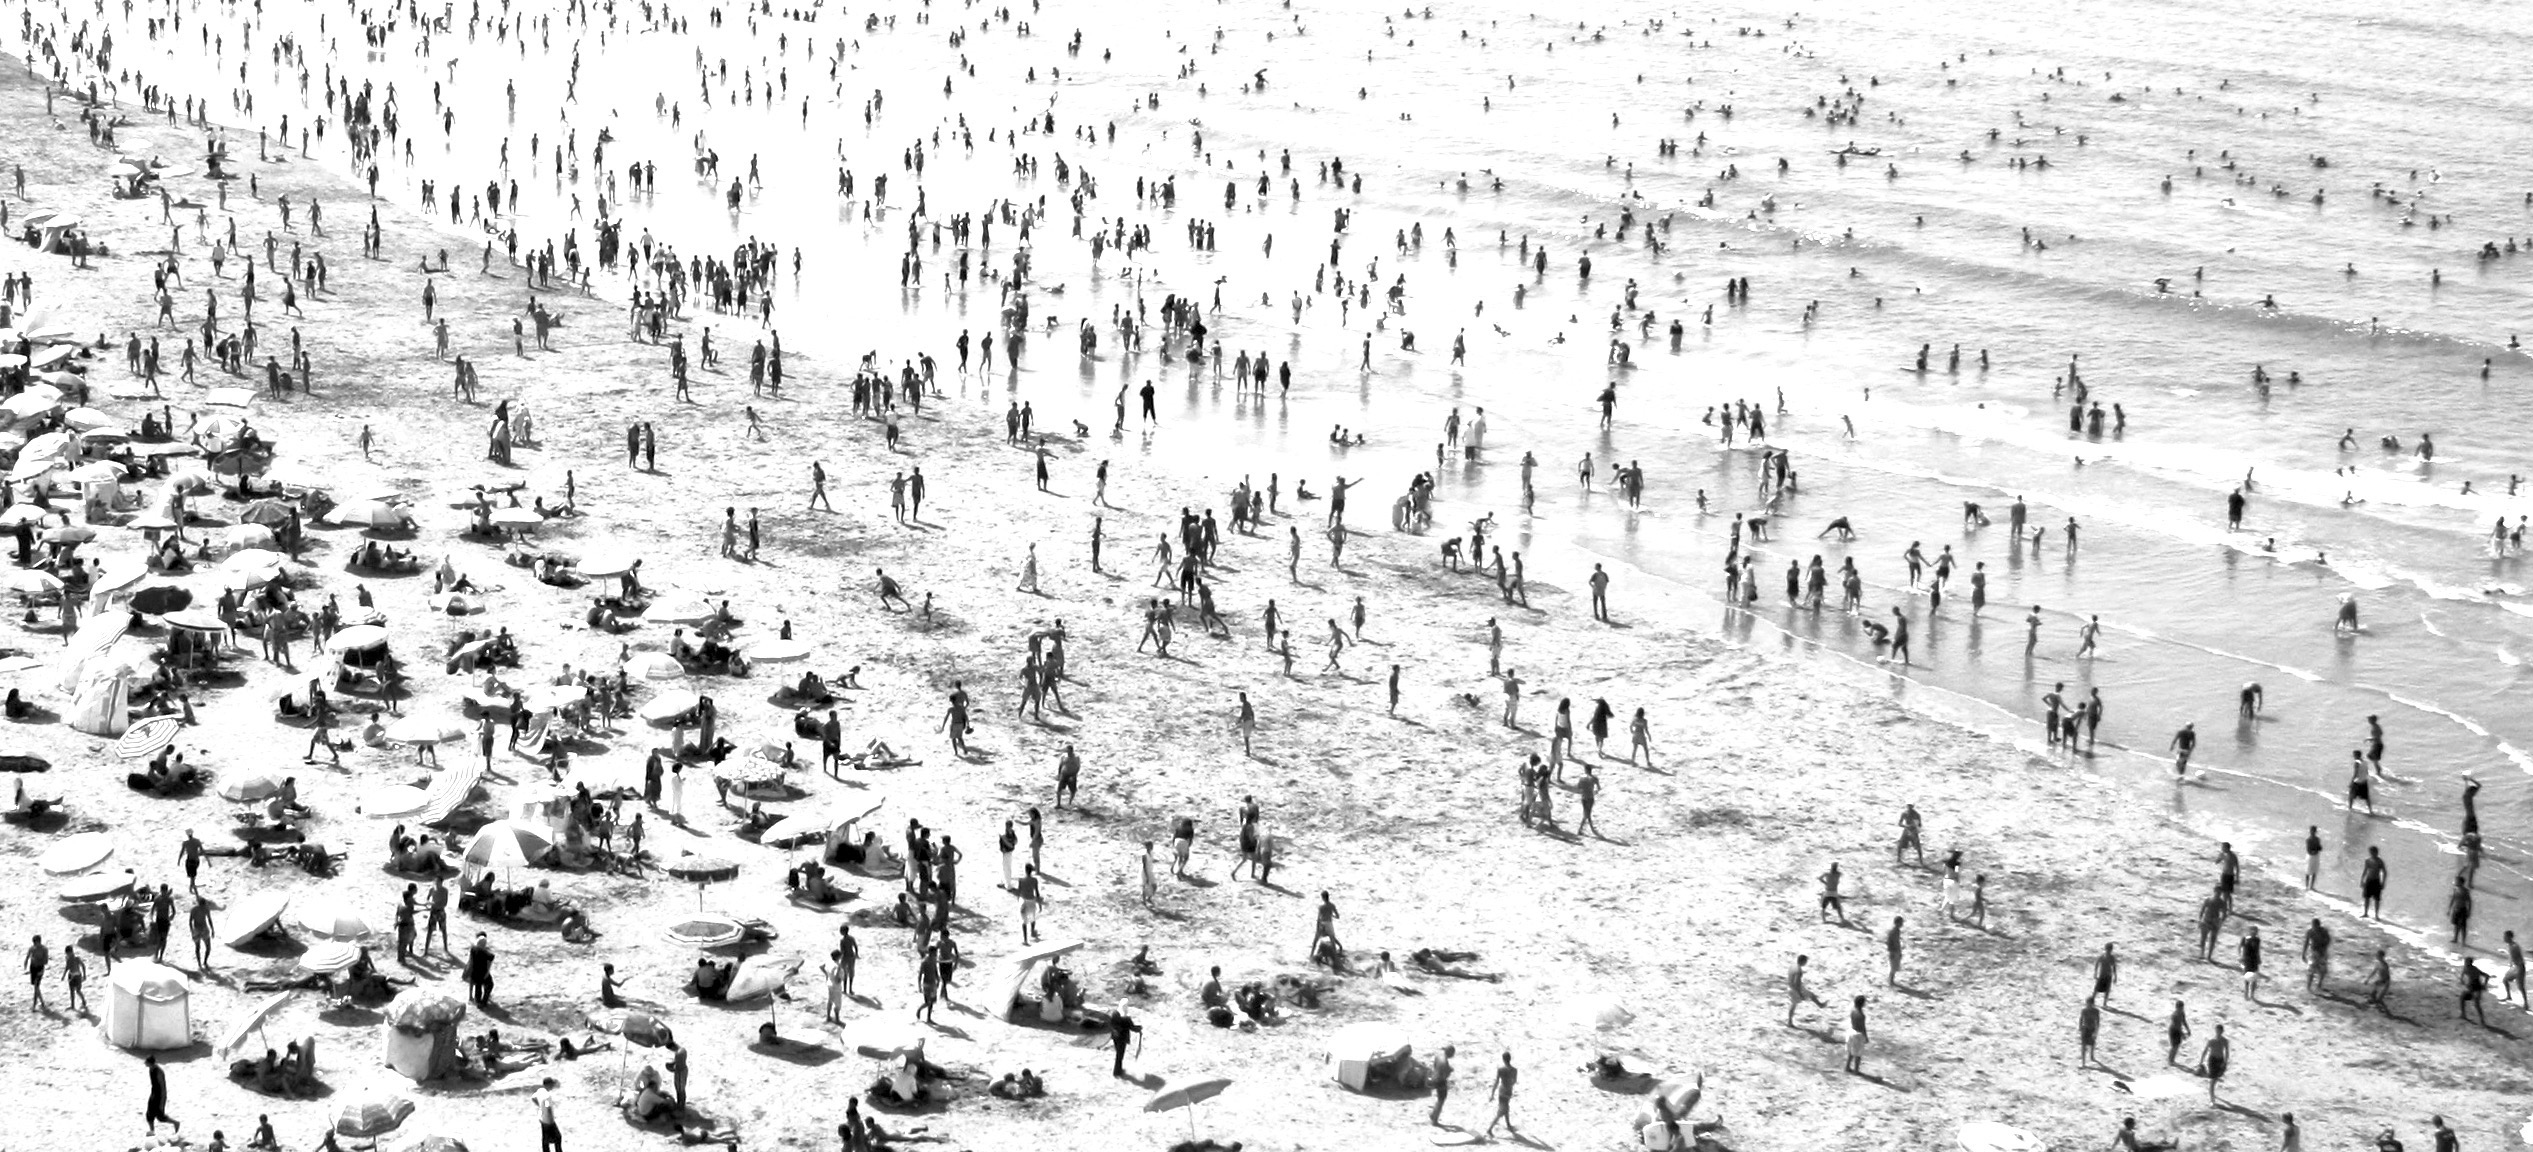 3_Crowded_Beach_Rabat_Morocco_2009